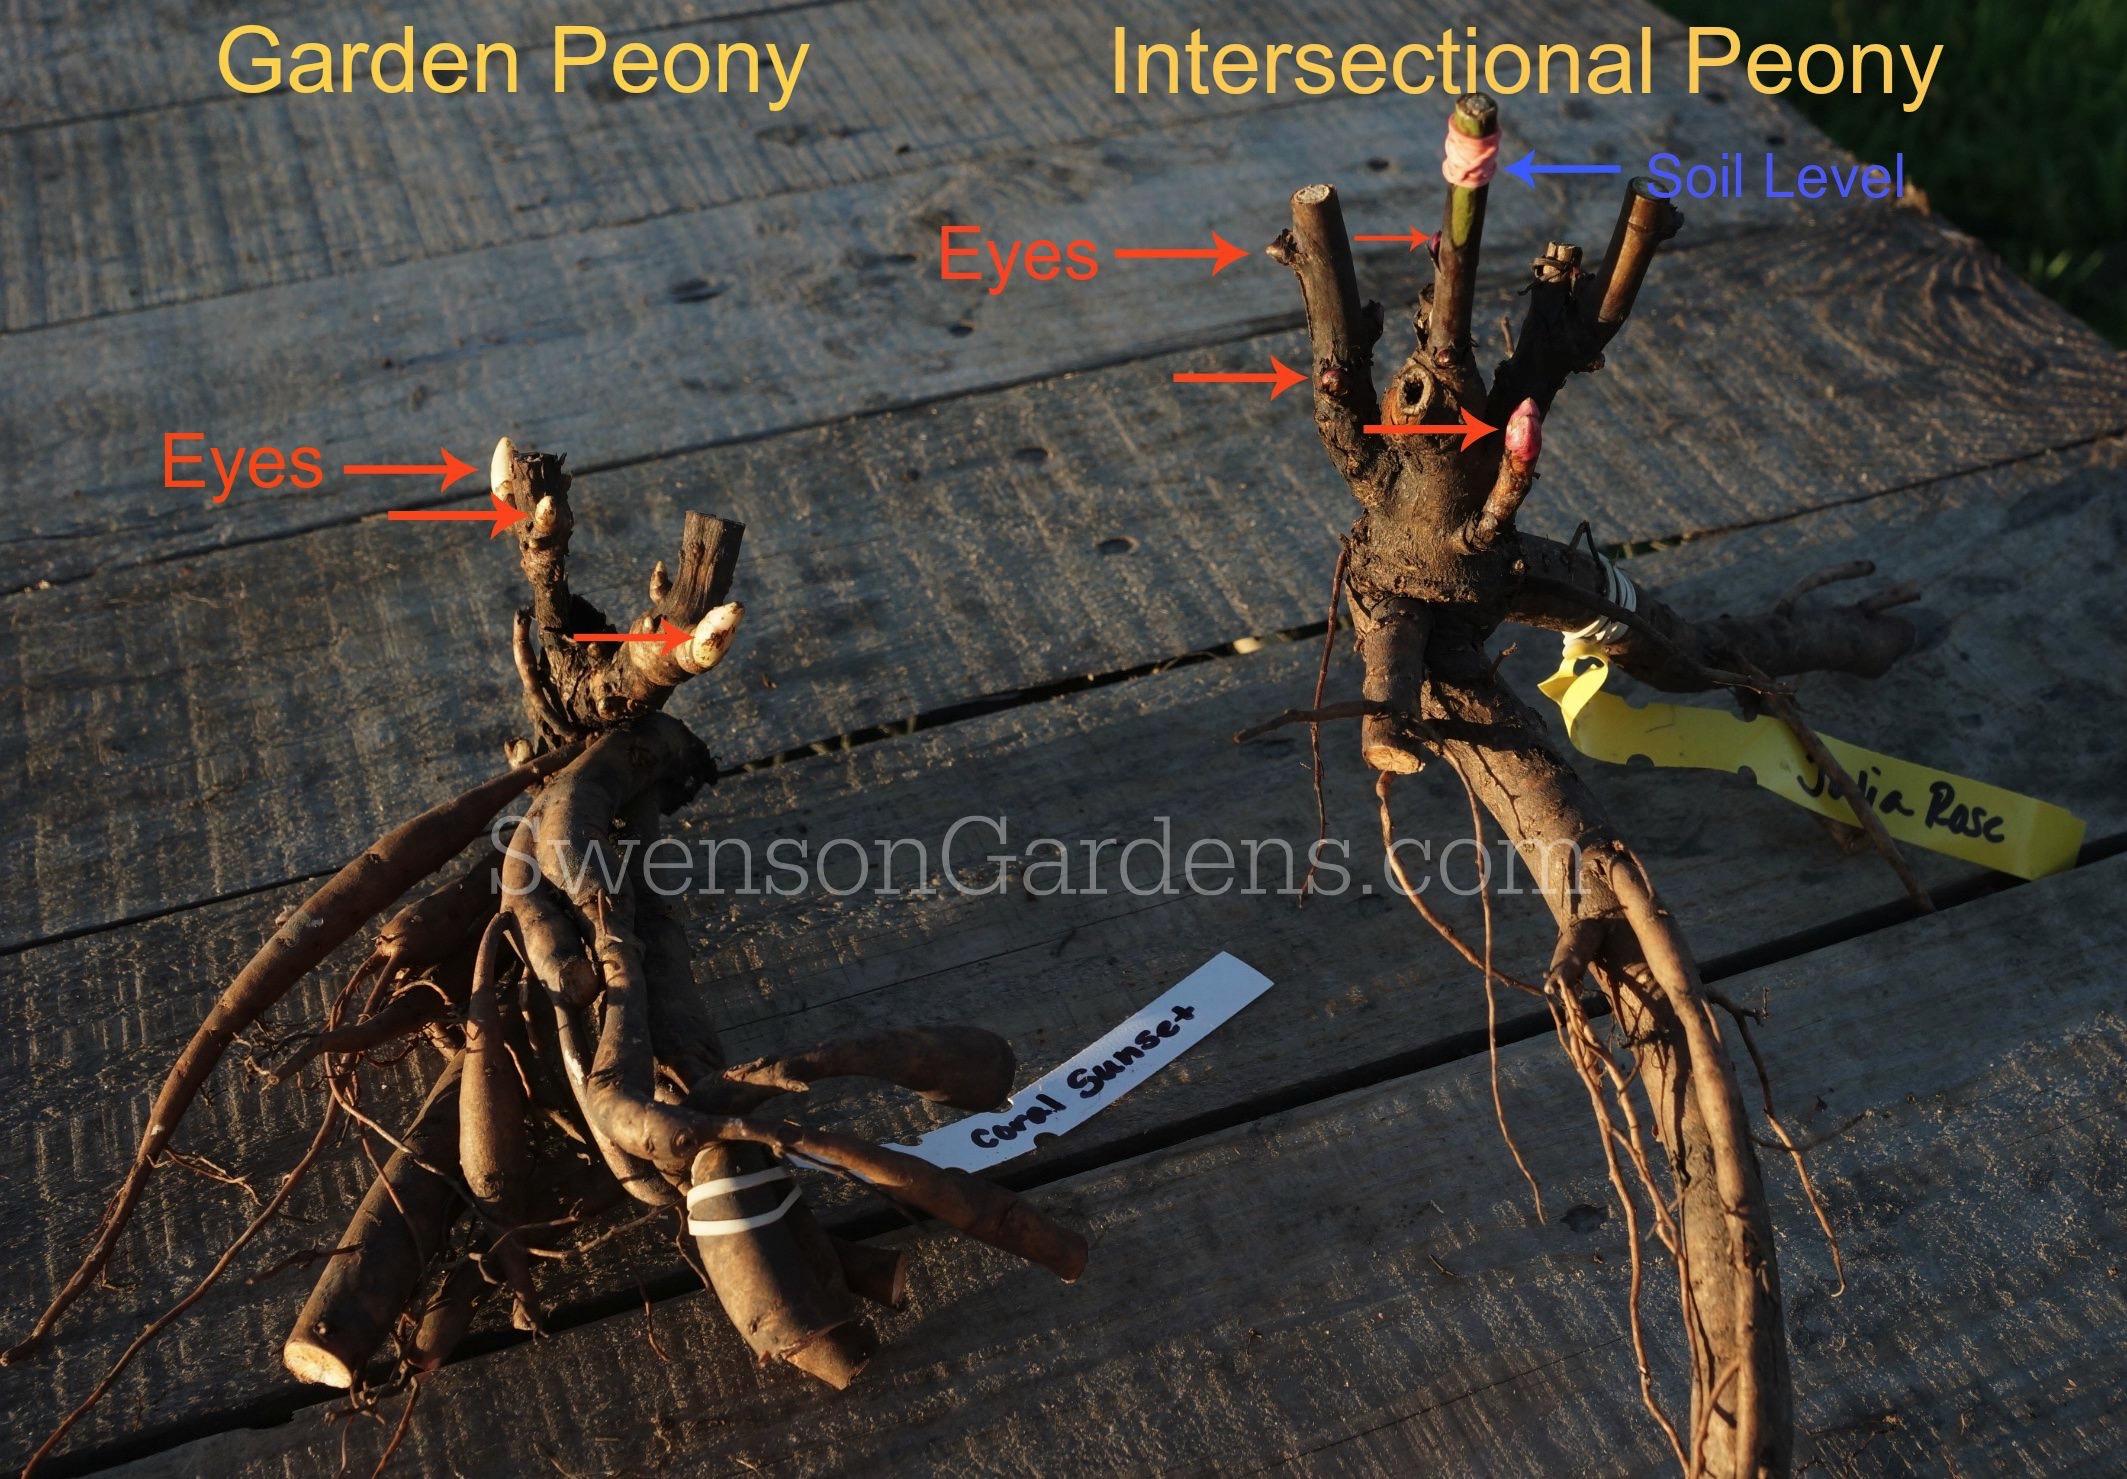 Bare Root Peonies Swenson Gardens